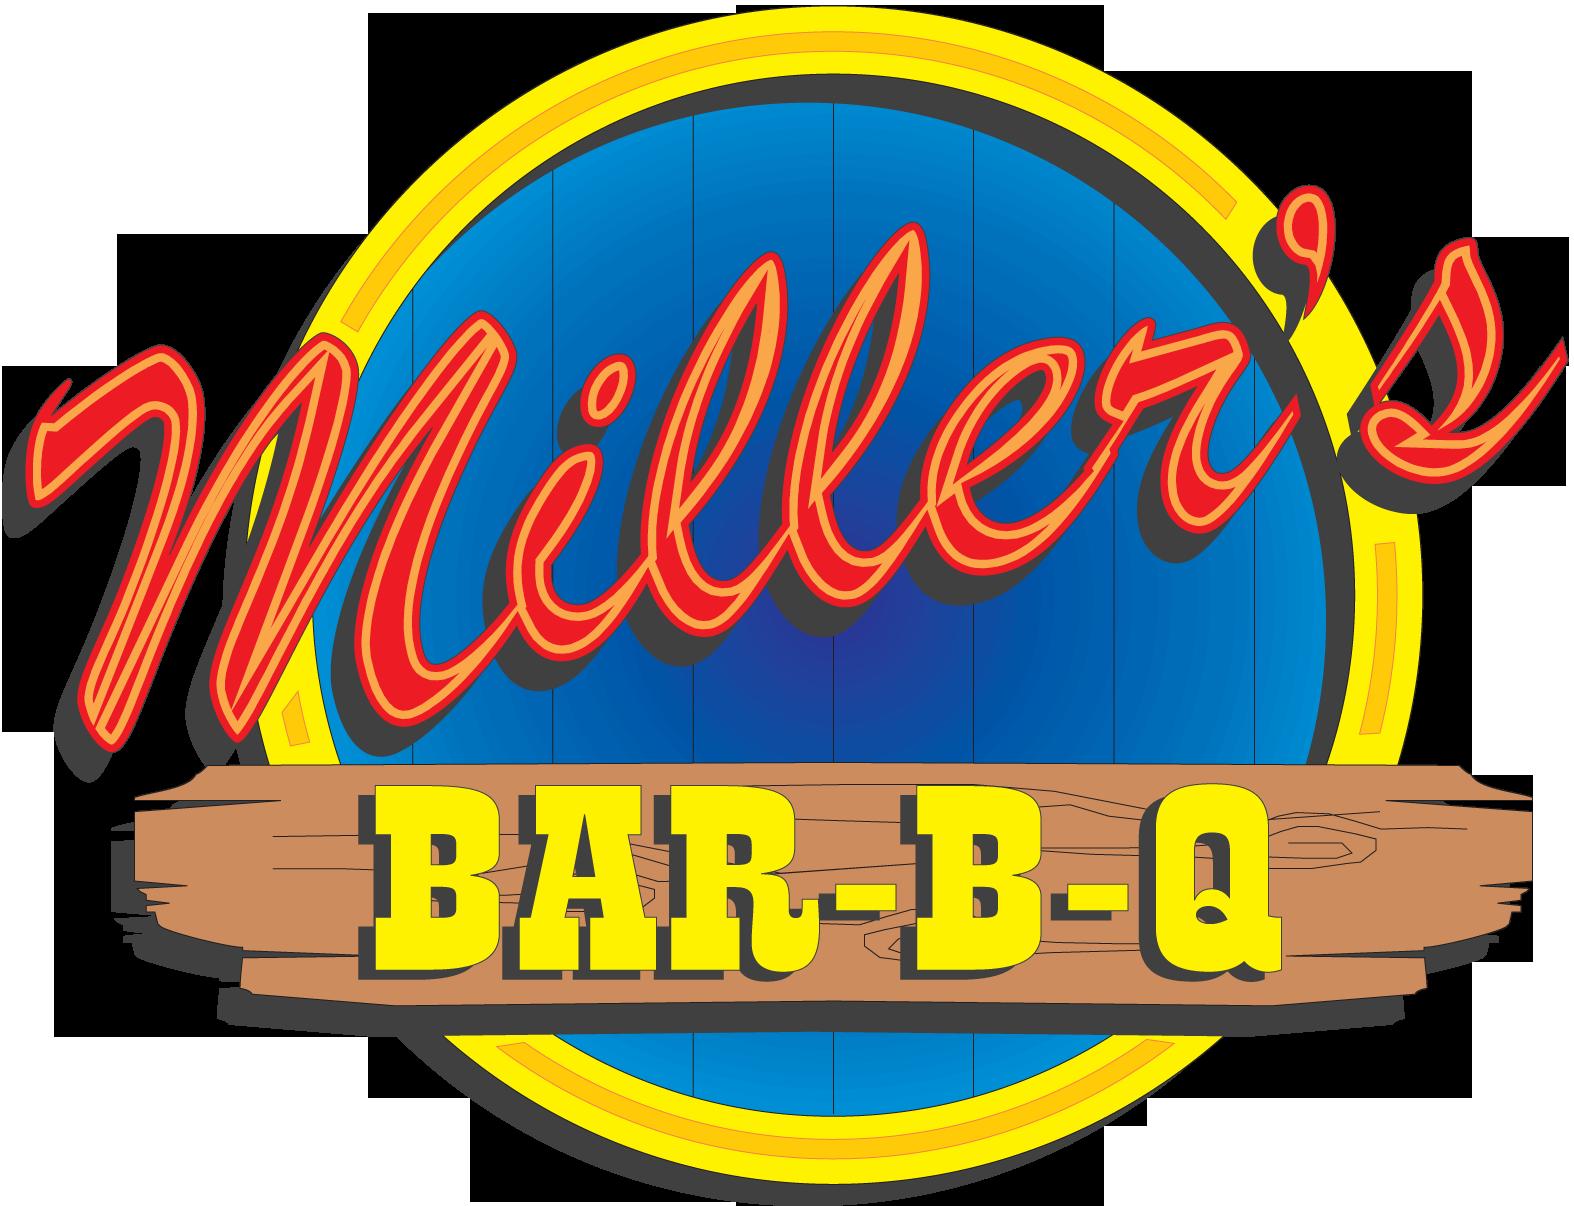 Miller's BarBQ Corpus Christi, Texas - South Texas' Greatest BarBQ